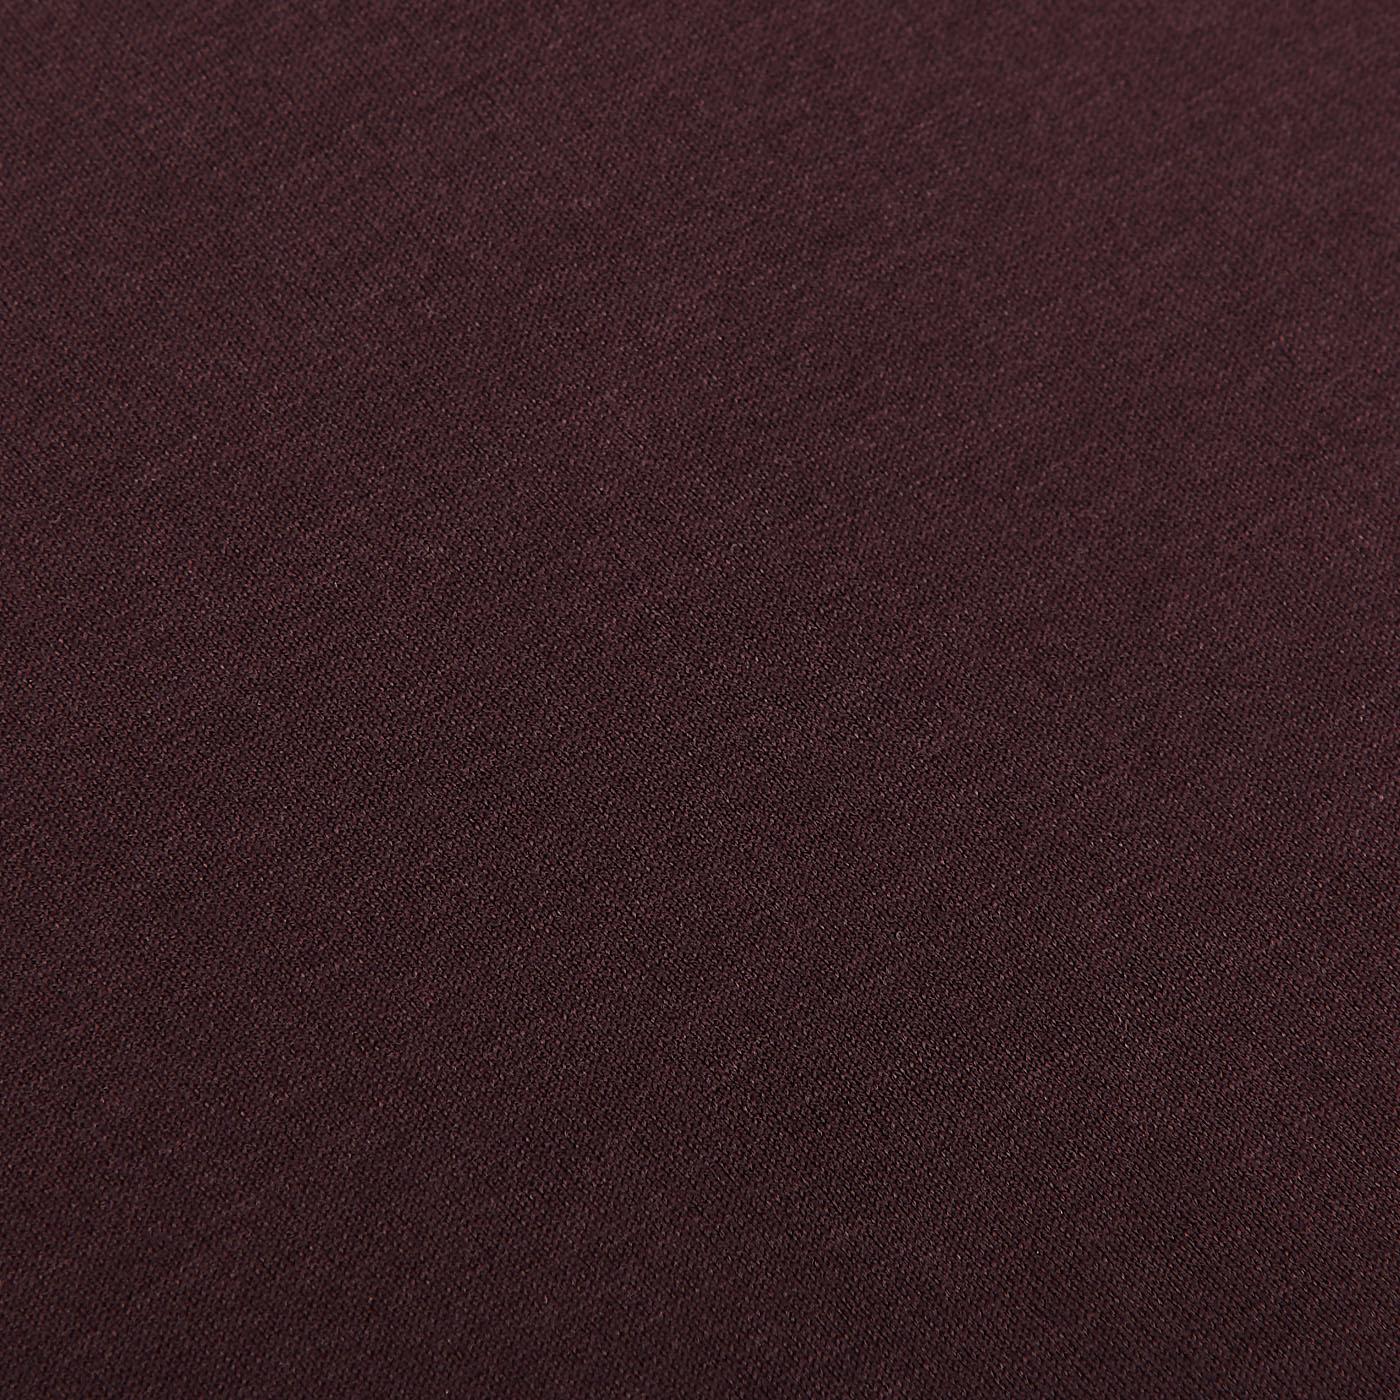 Sunspel Espresso Classic Cotton T-shirt Fabric